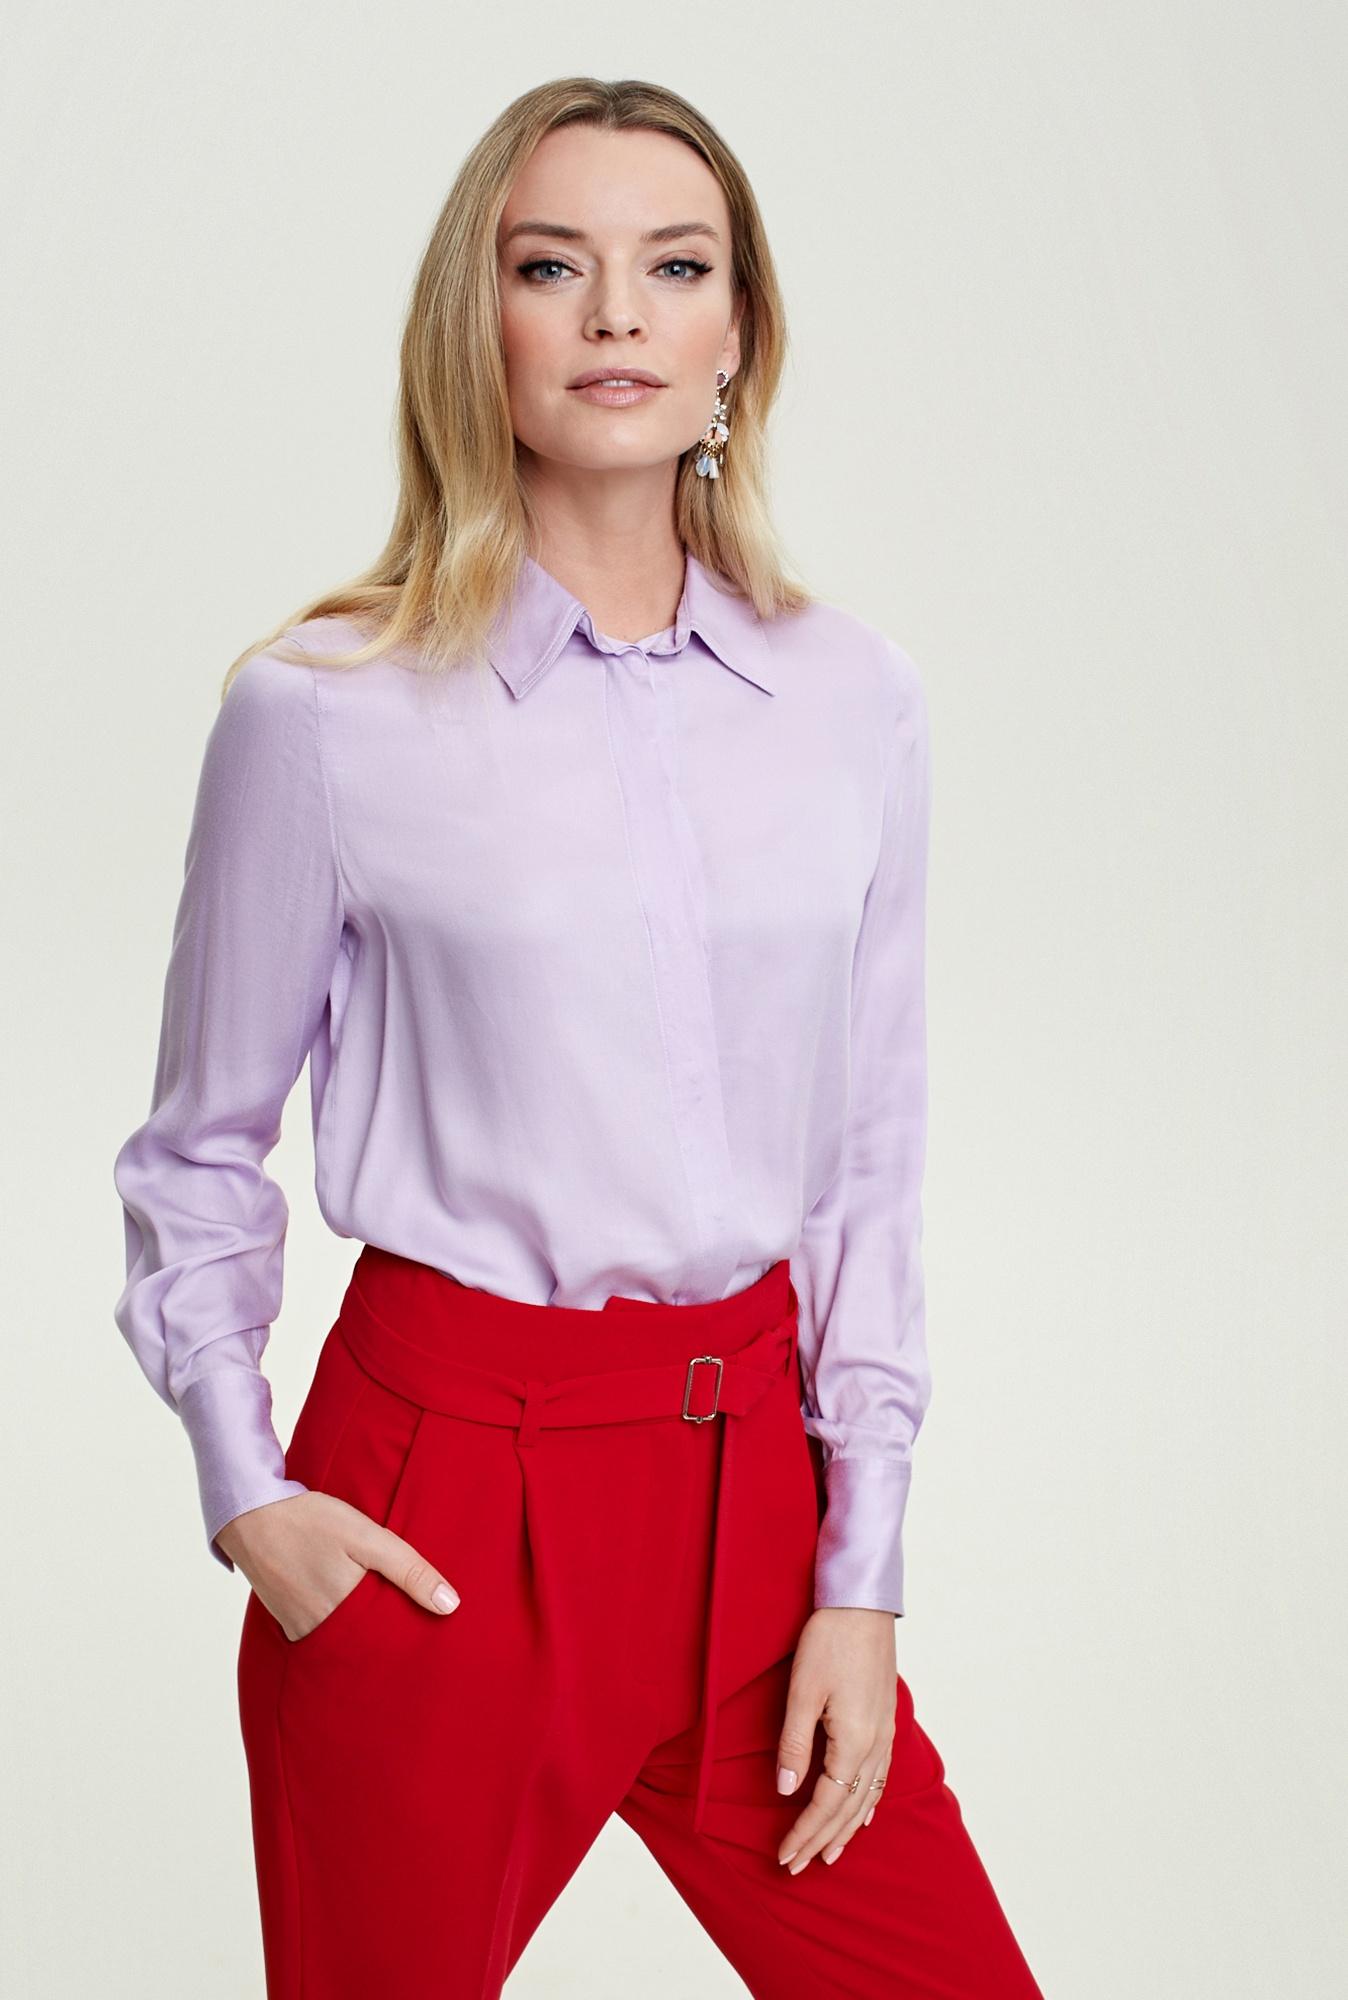 Блузка Concept Club блузка женская concept club nane цвет белый 10200260289 200 размер xs 42